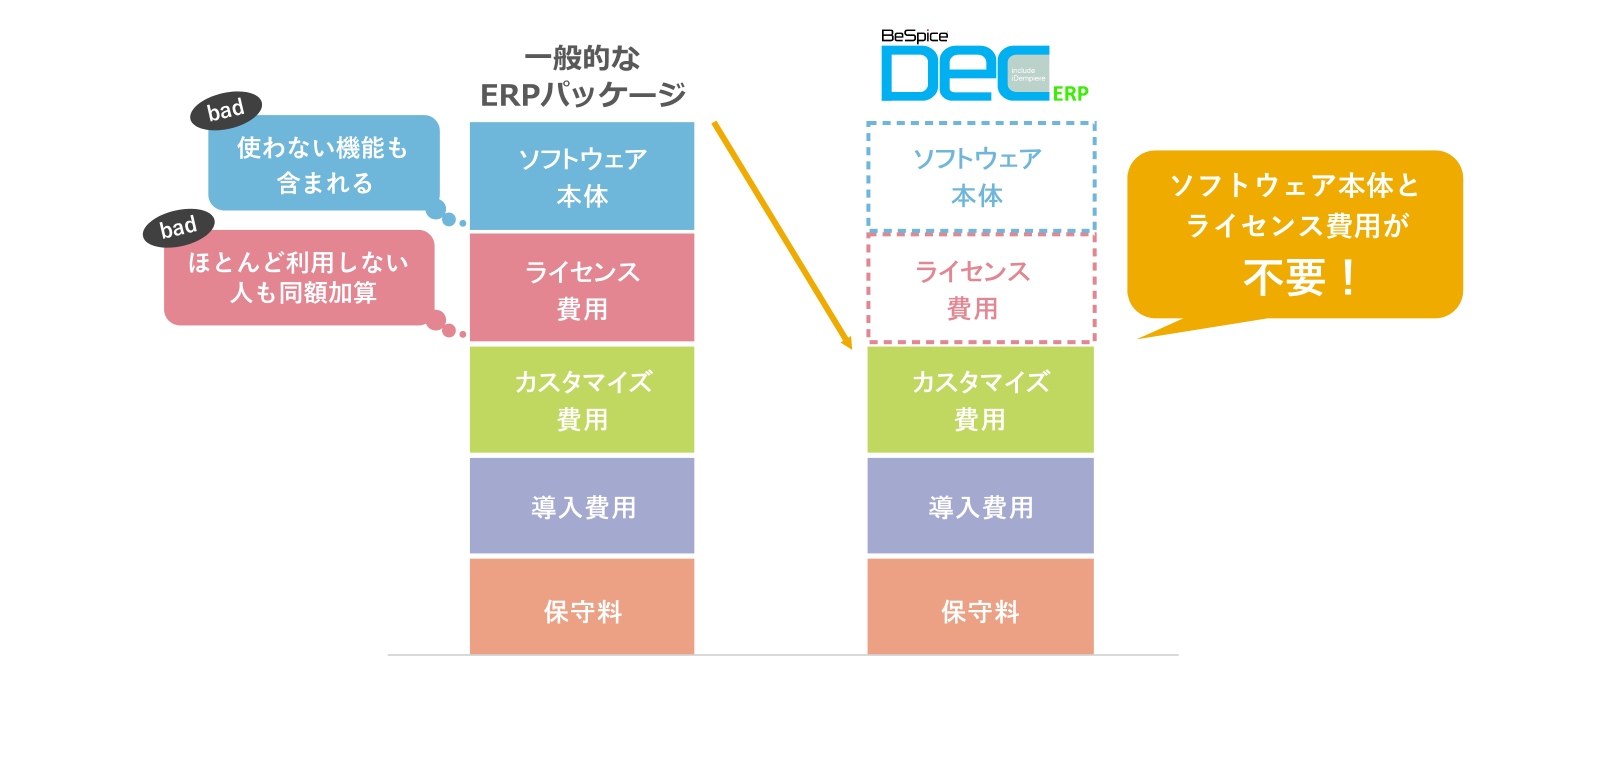 DecERPのメリット1 ソフトウェア本体とライセンス費用が不要